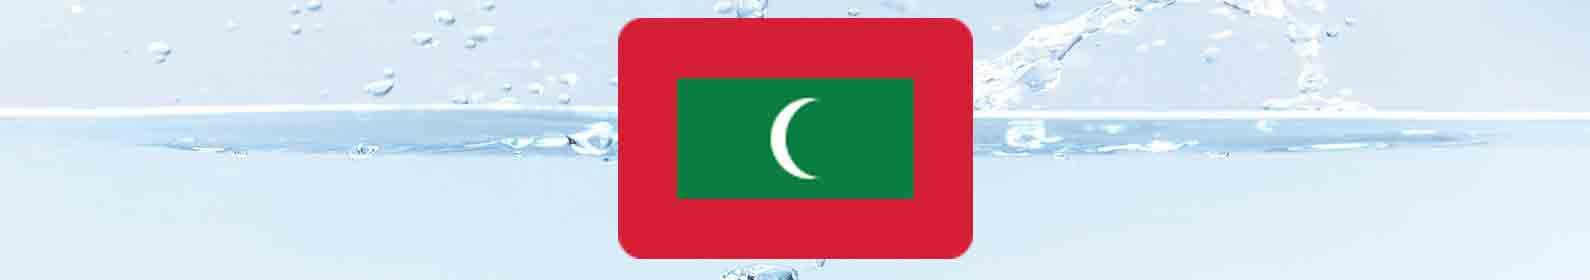 water-treatment-maldives.jpg